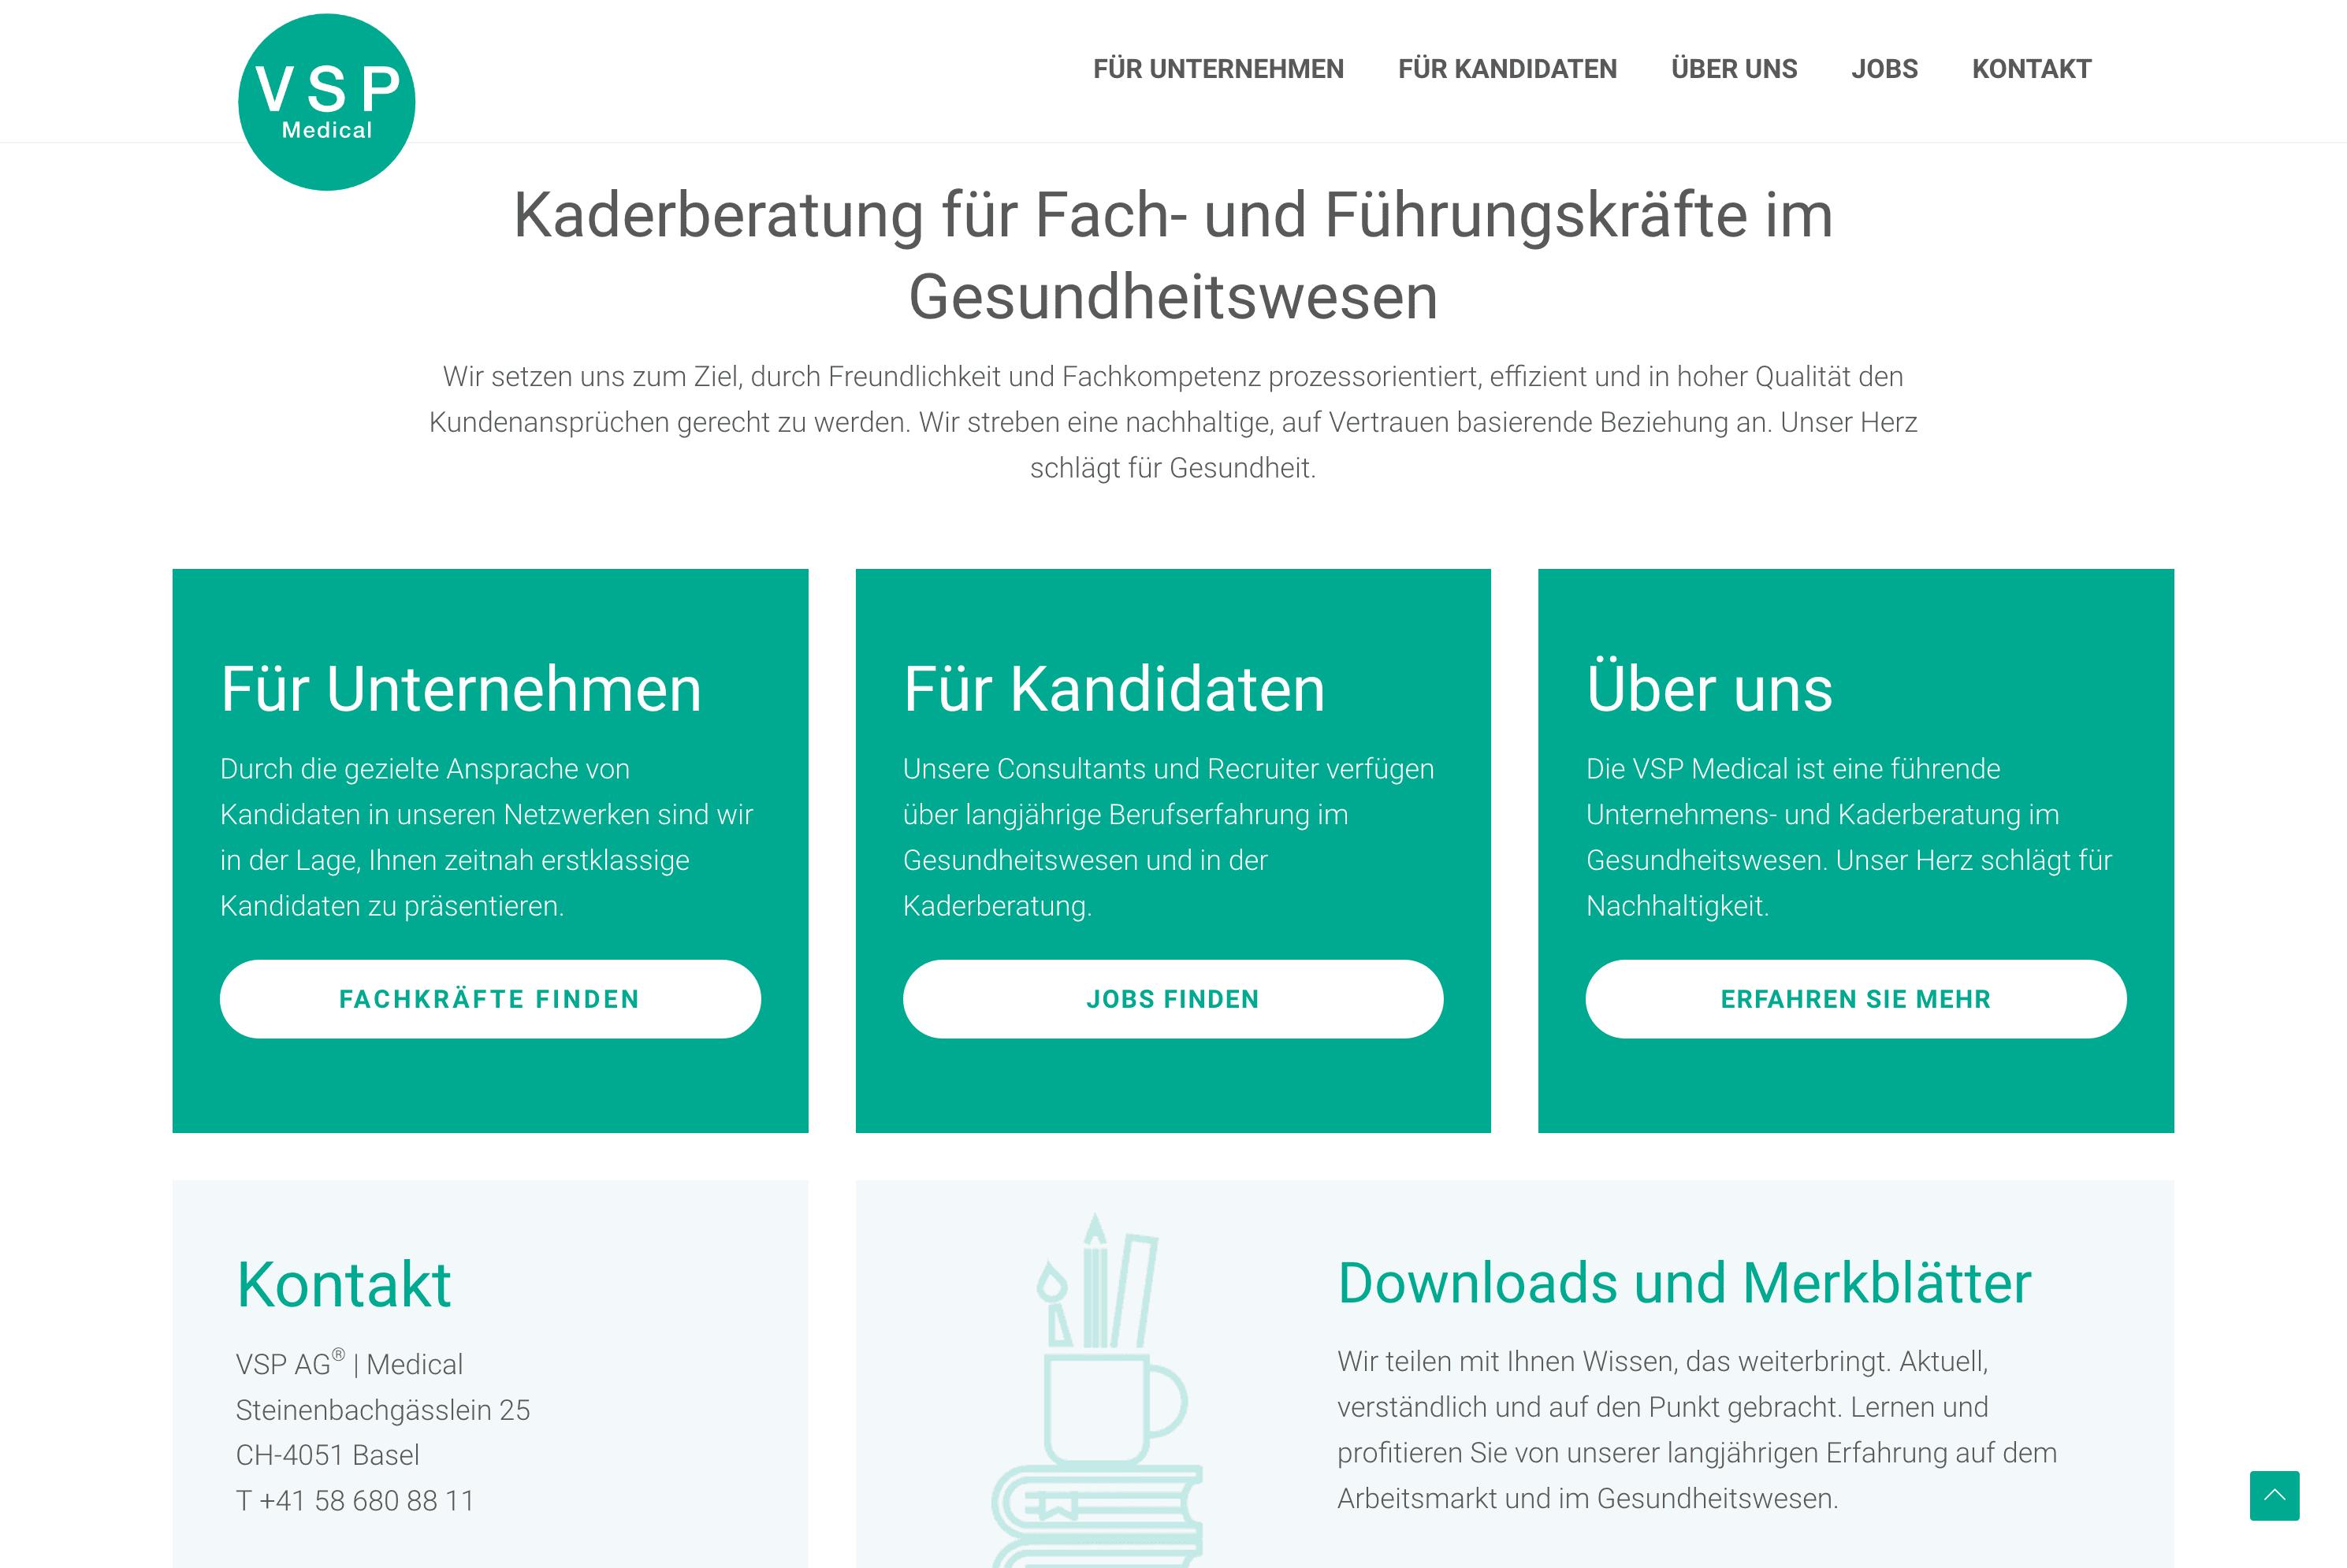 Screenshot 2021 02 08 Vsp Medical – Unternehmens Und Kaderberatung